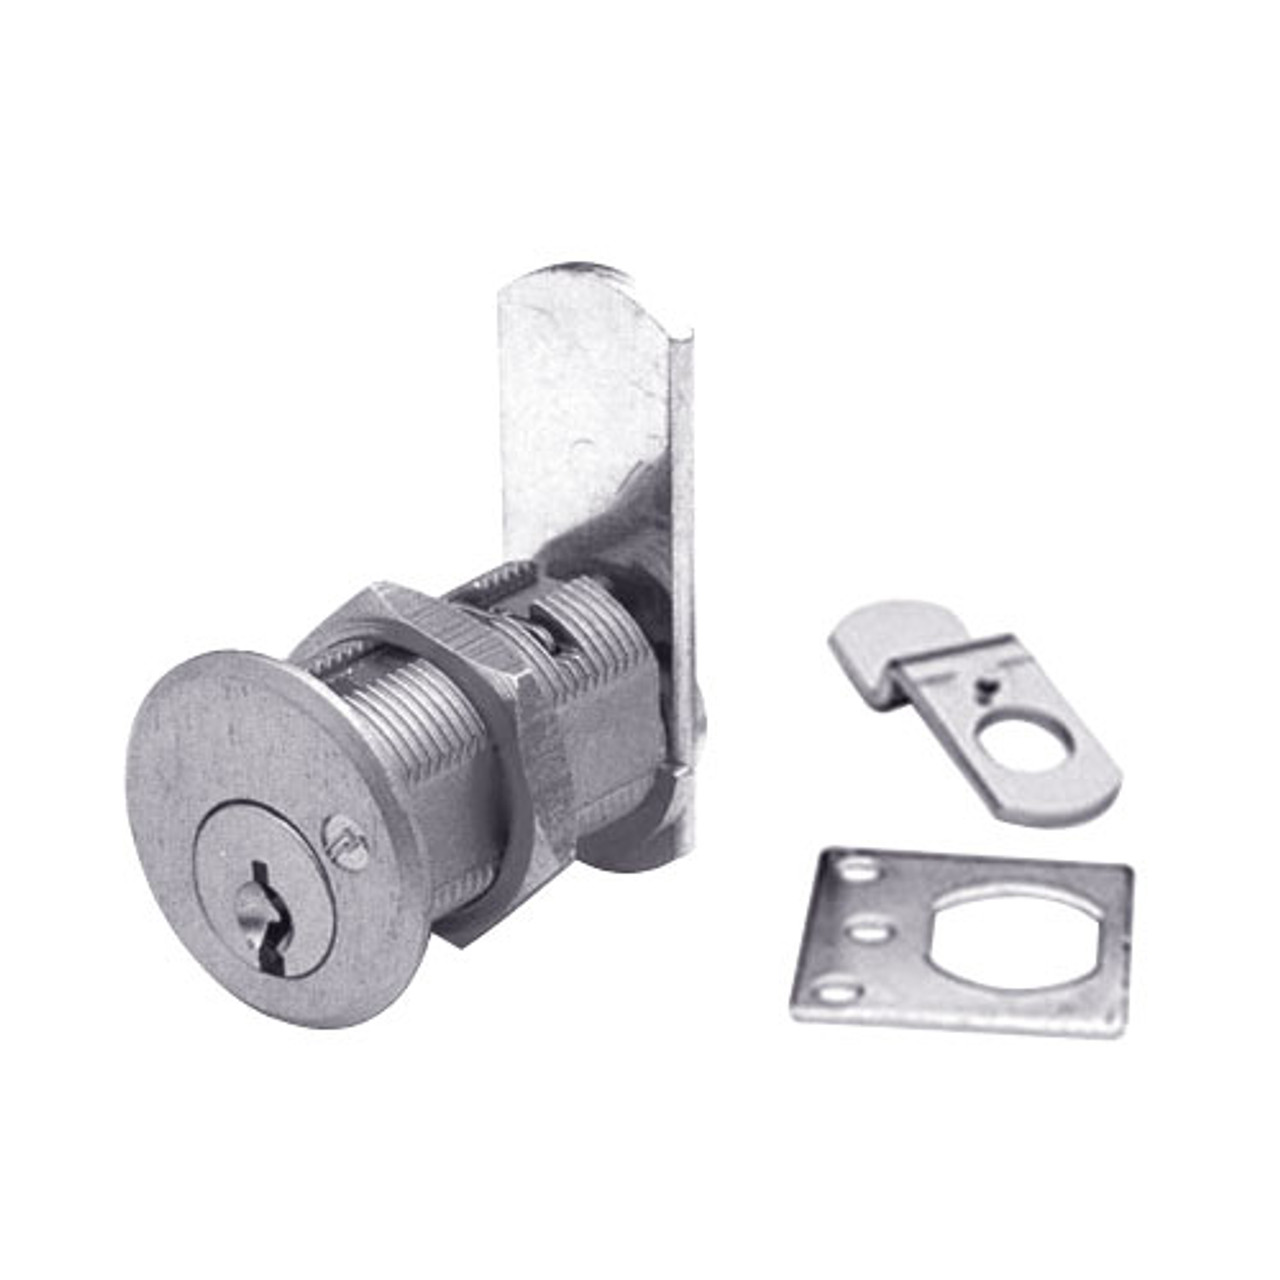 Olympus DCN2-KA101-26D Cam Locks in Satin Chrome Finish